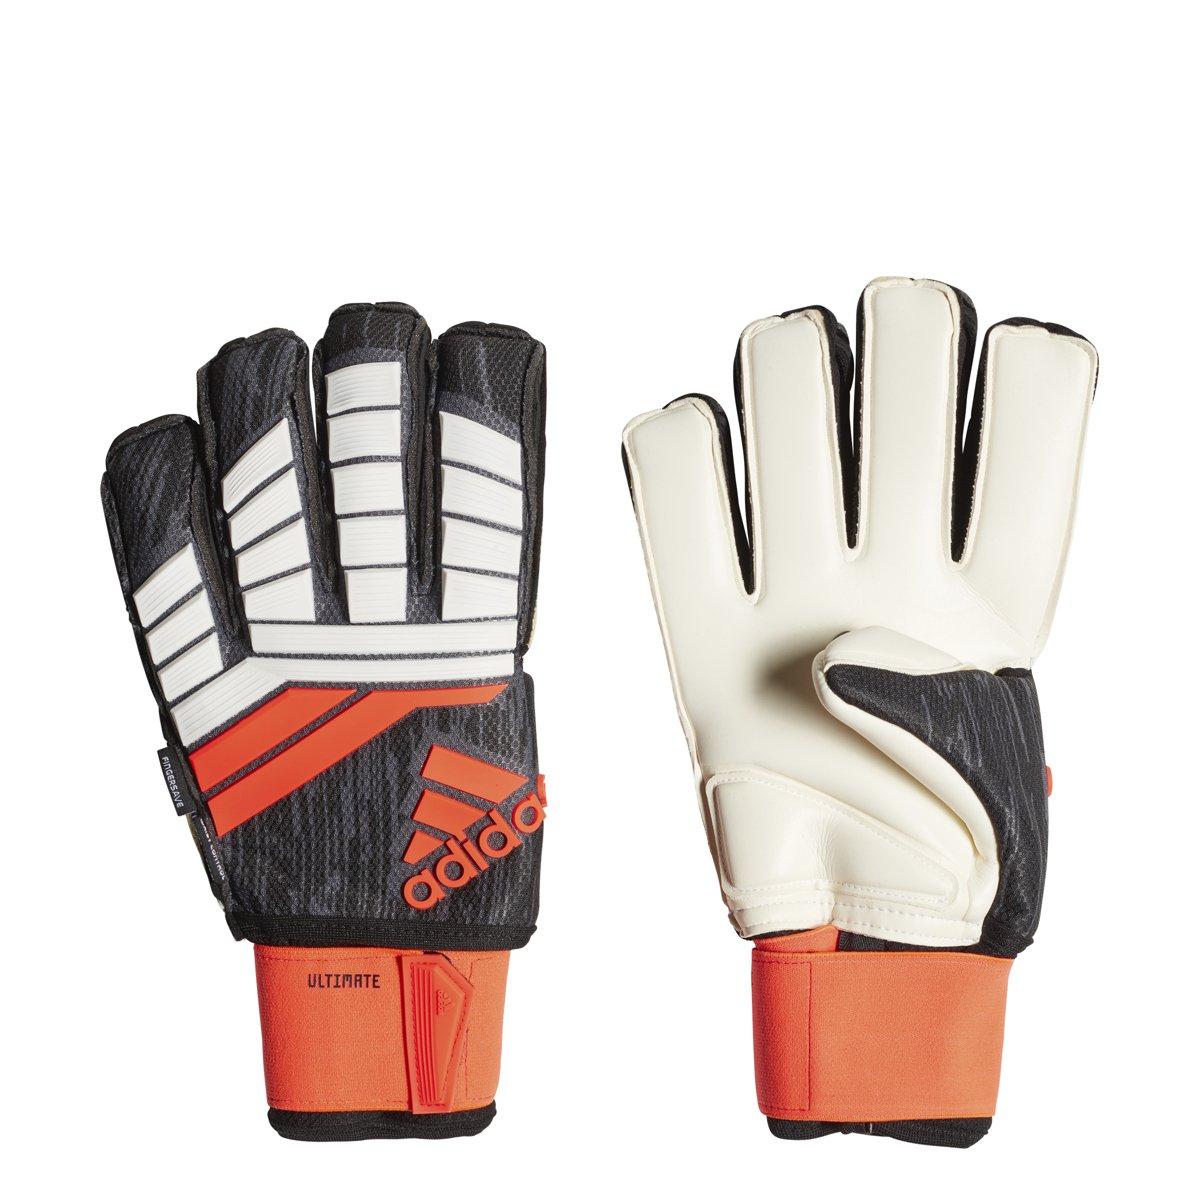 Adidas Ultimate PROTator Fingersave Torwart Handschuh